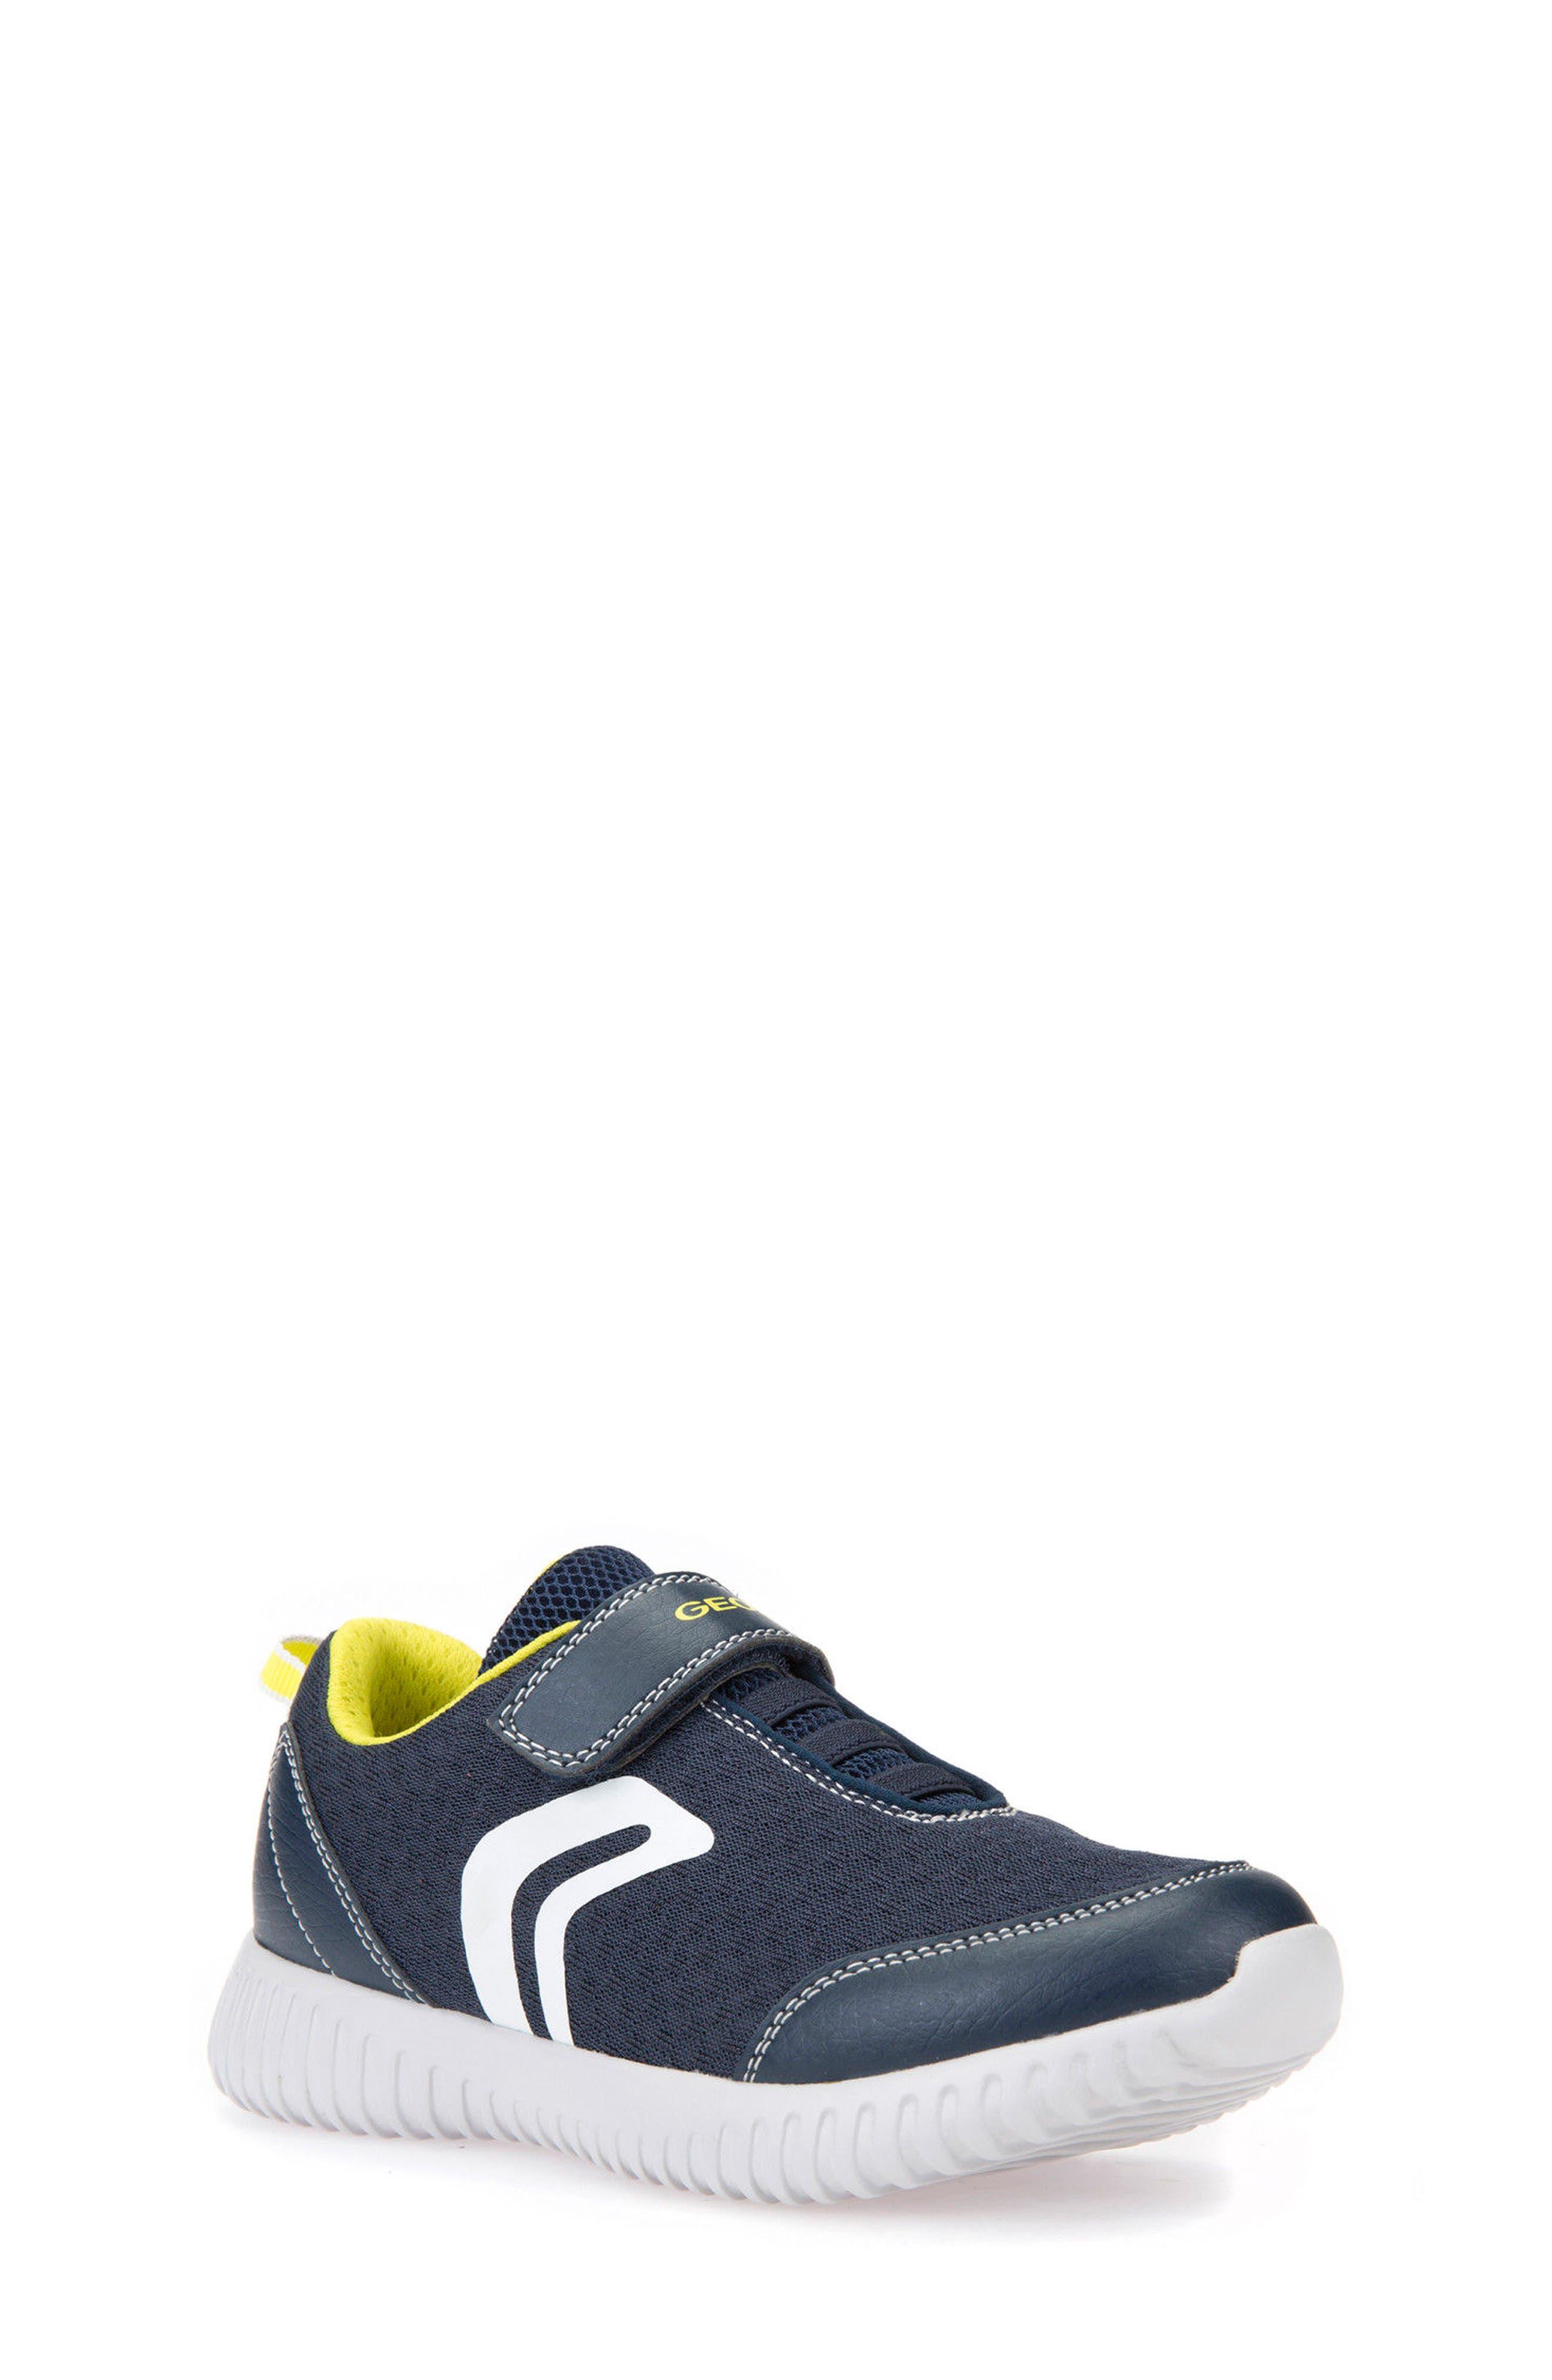 Boys Geox Waviness Sneaker Size 6US  39EU  Red